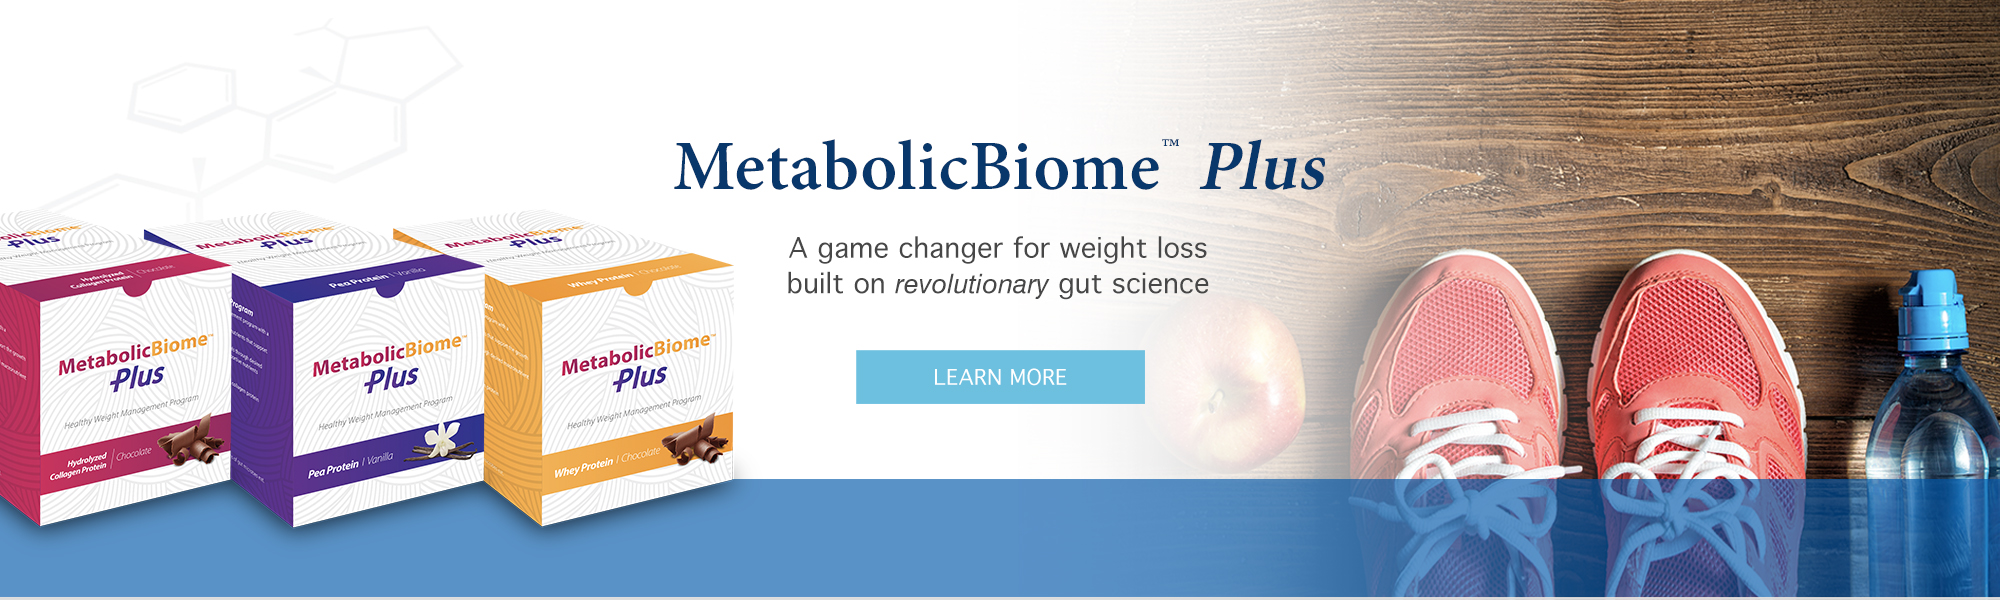 MetabolicBiomePlus_Banner1